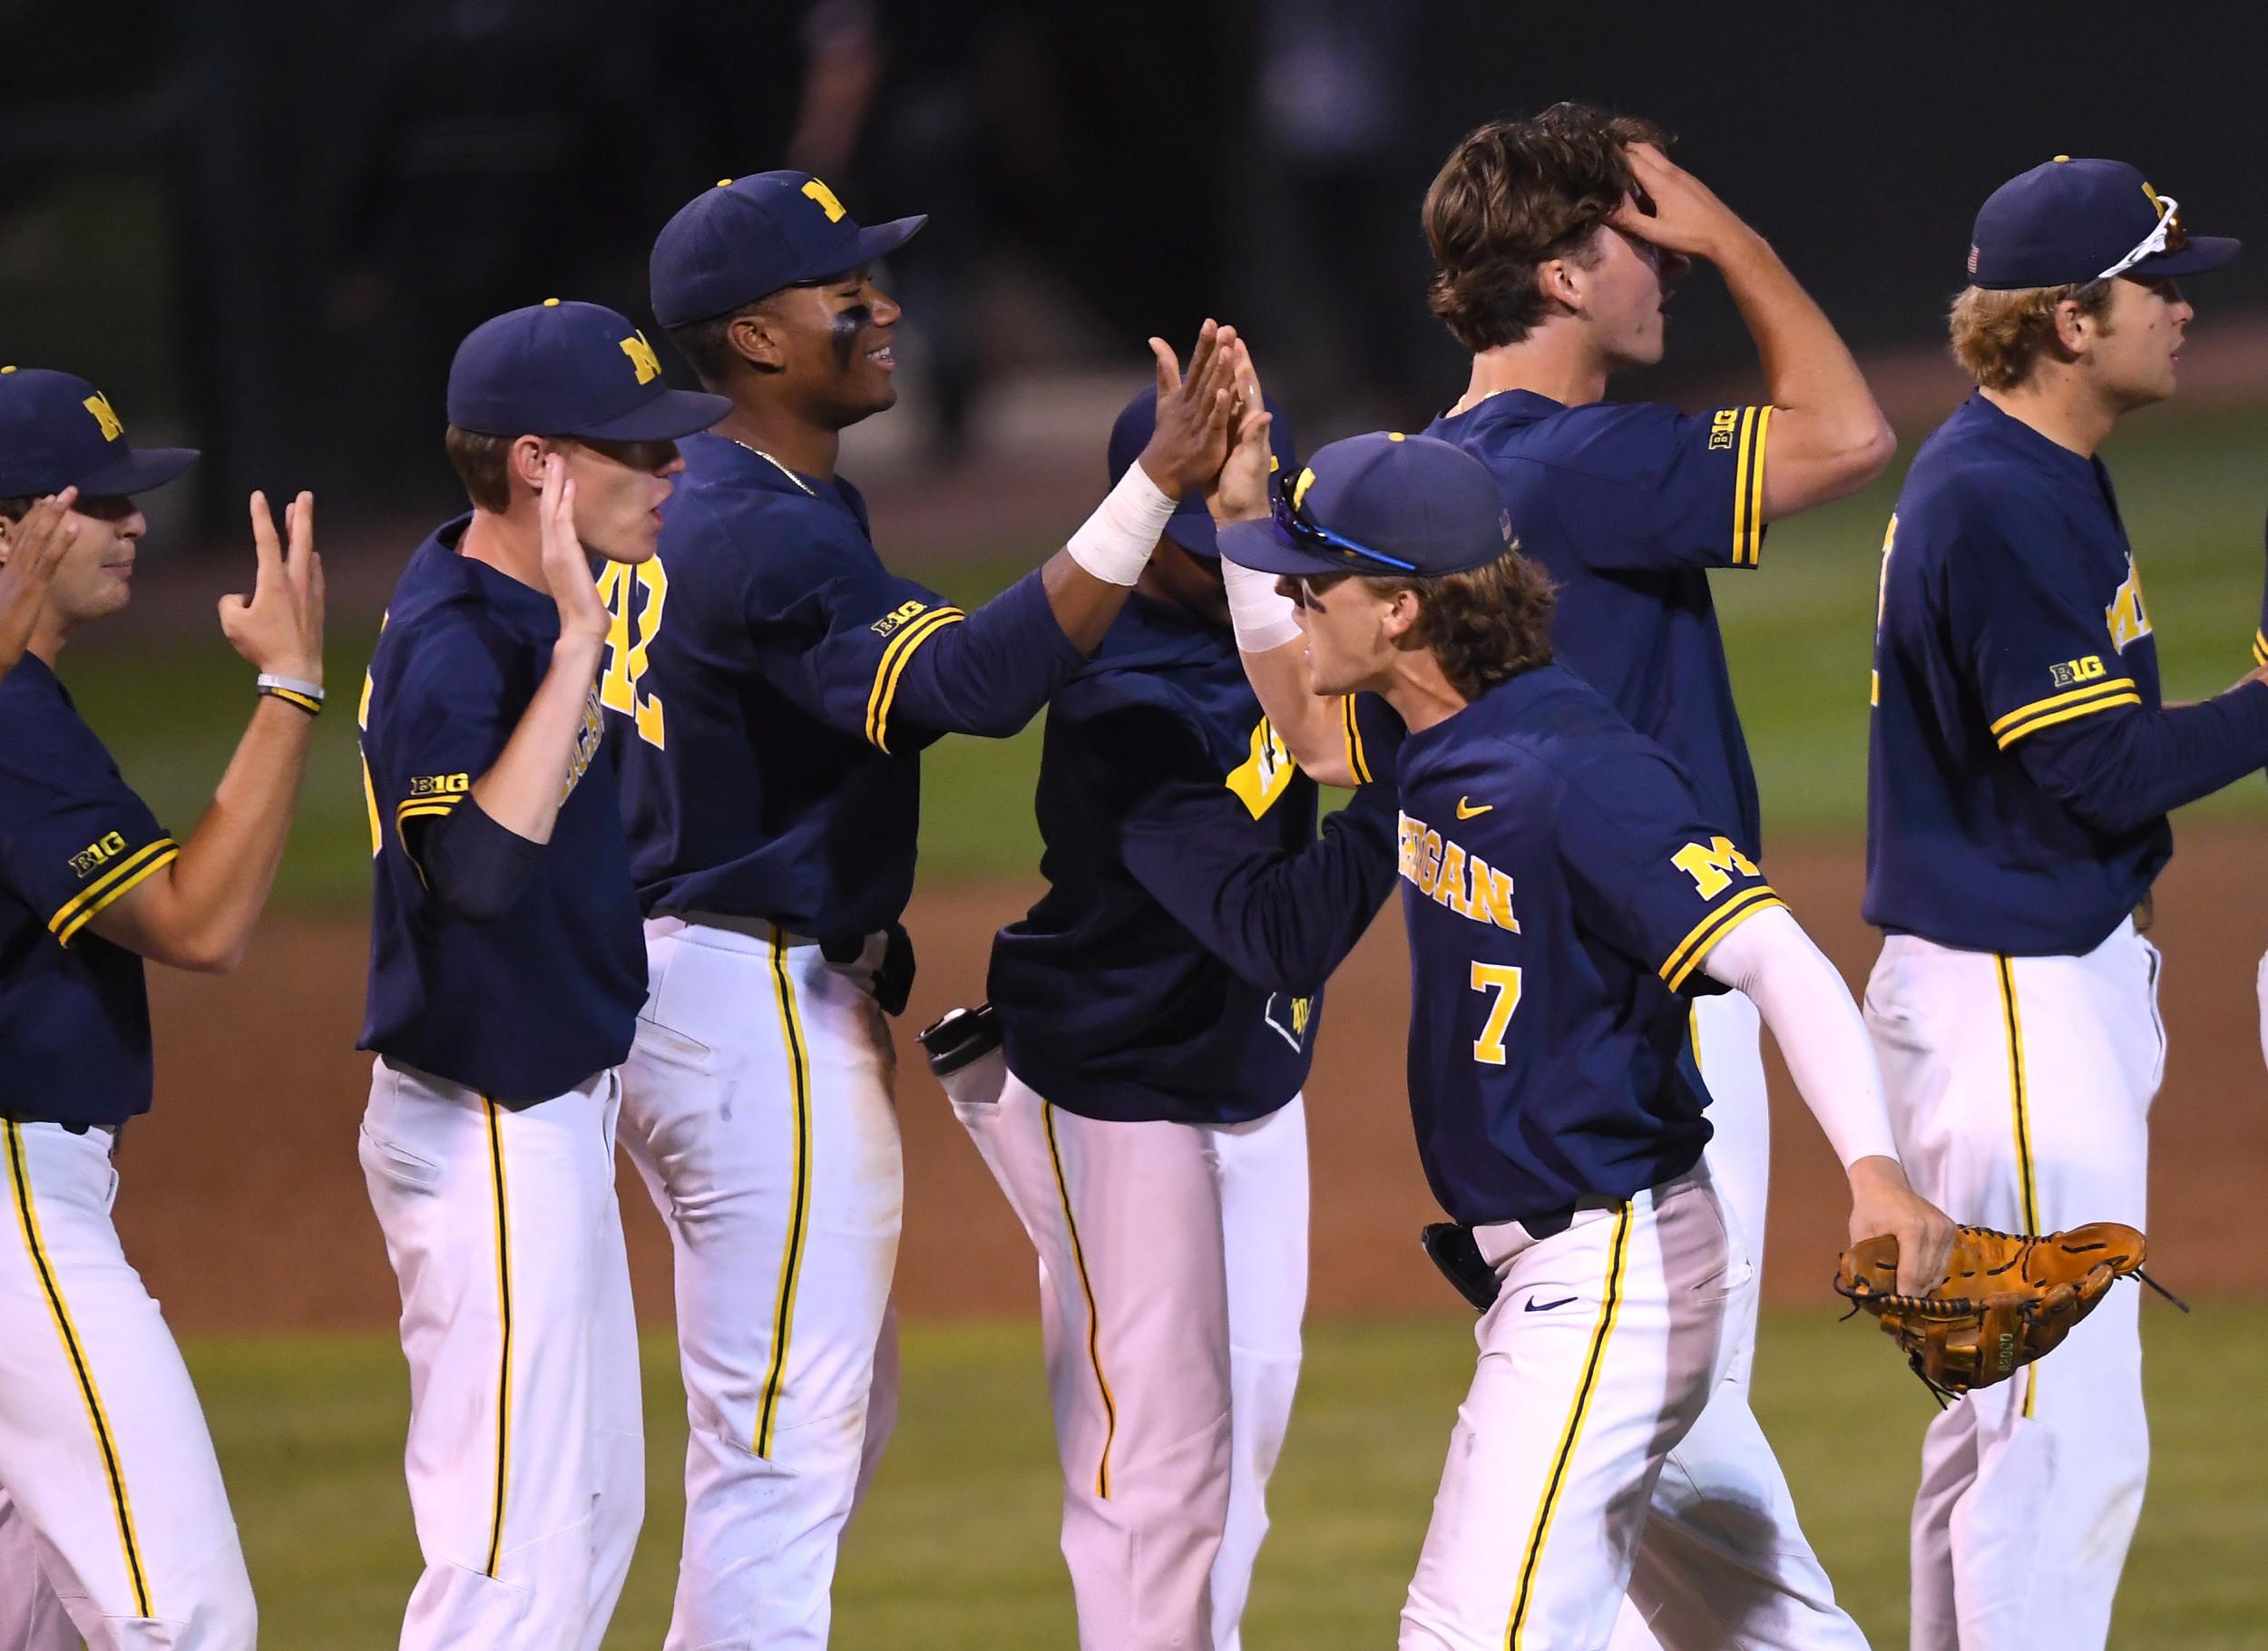 College baseball world series betting odds winners off track betting bayonne nj